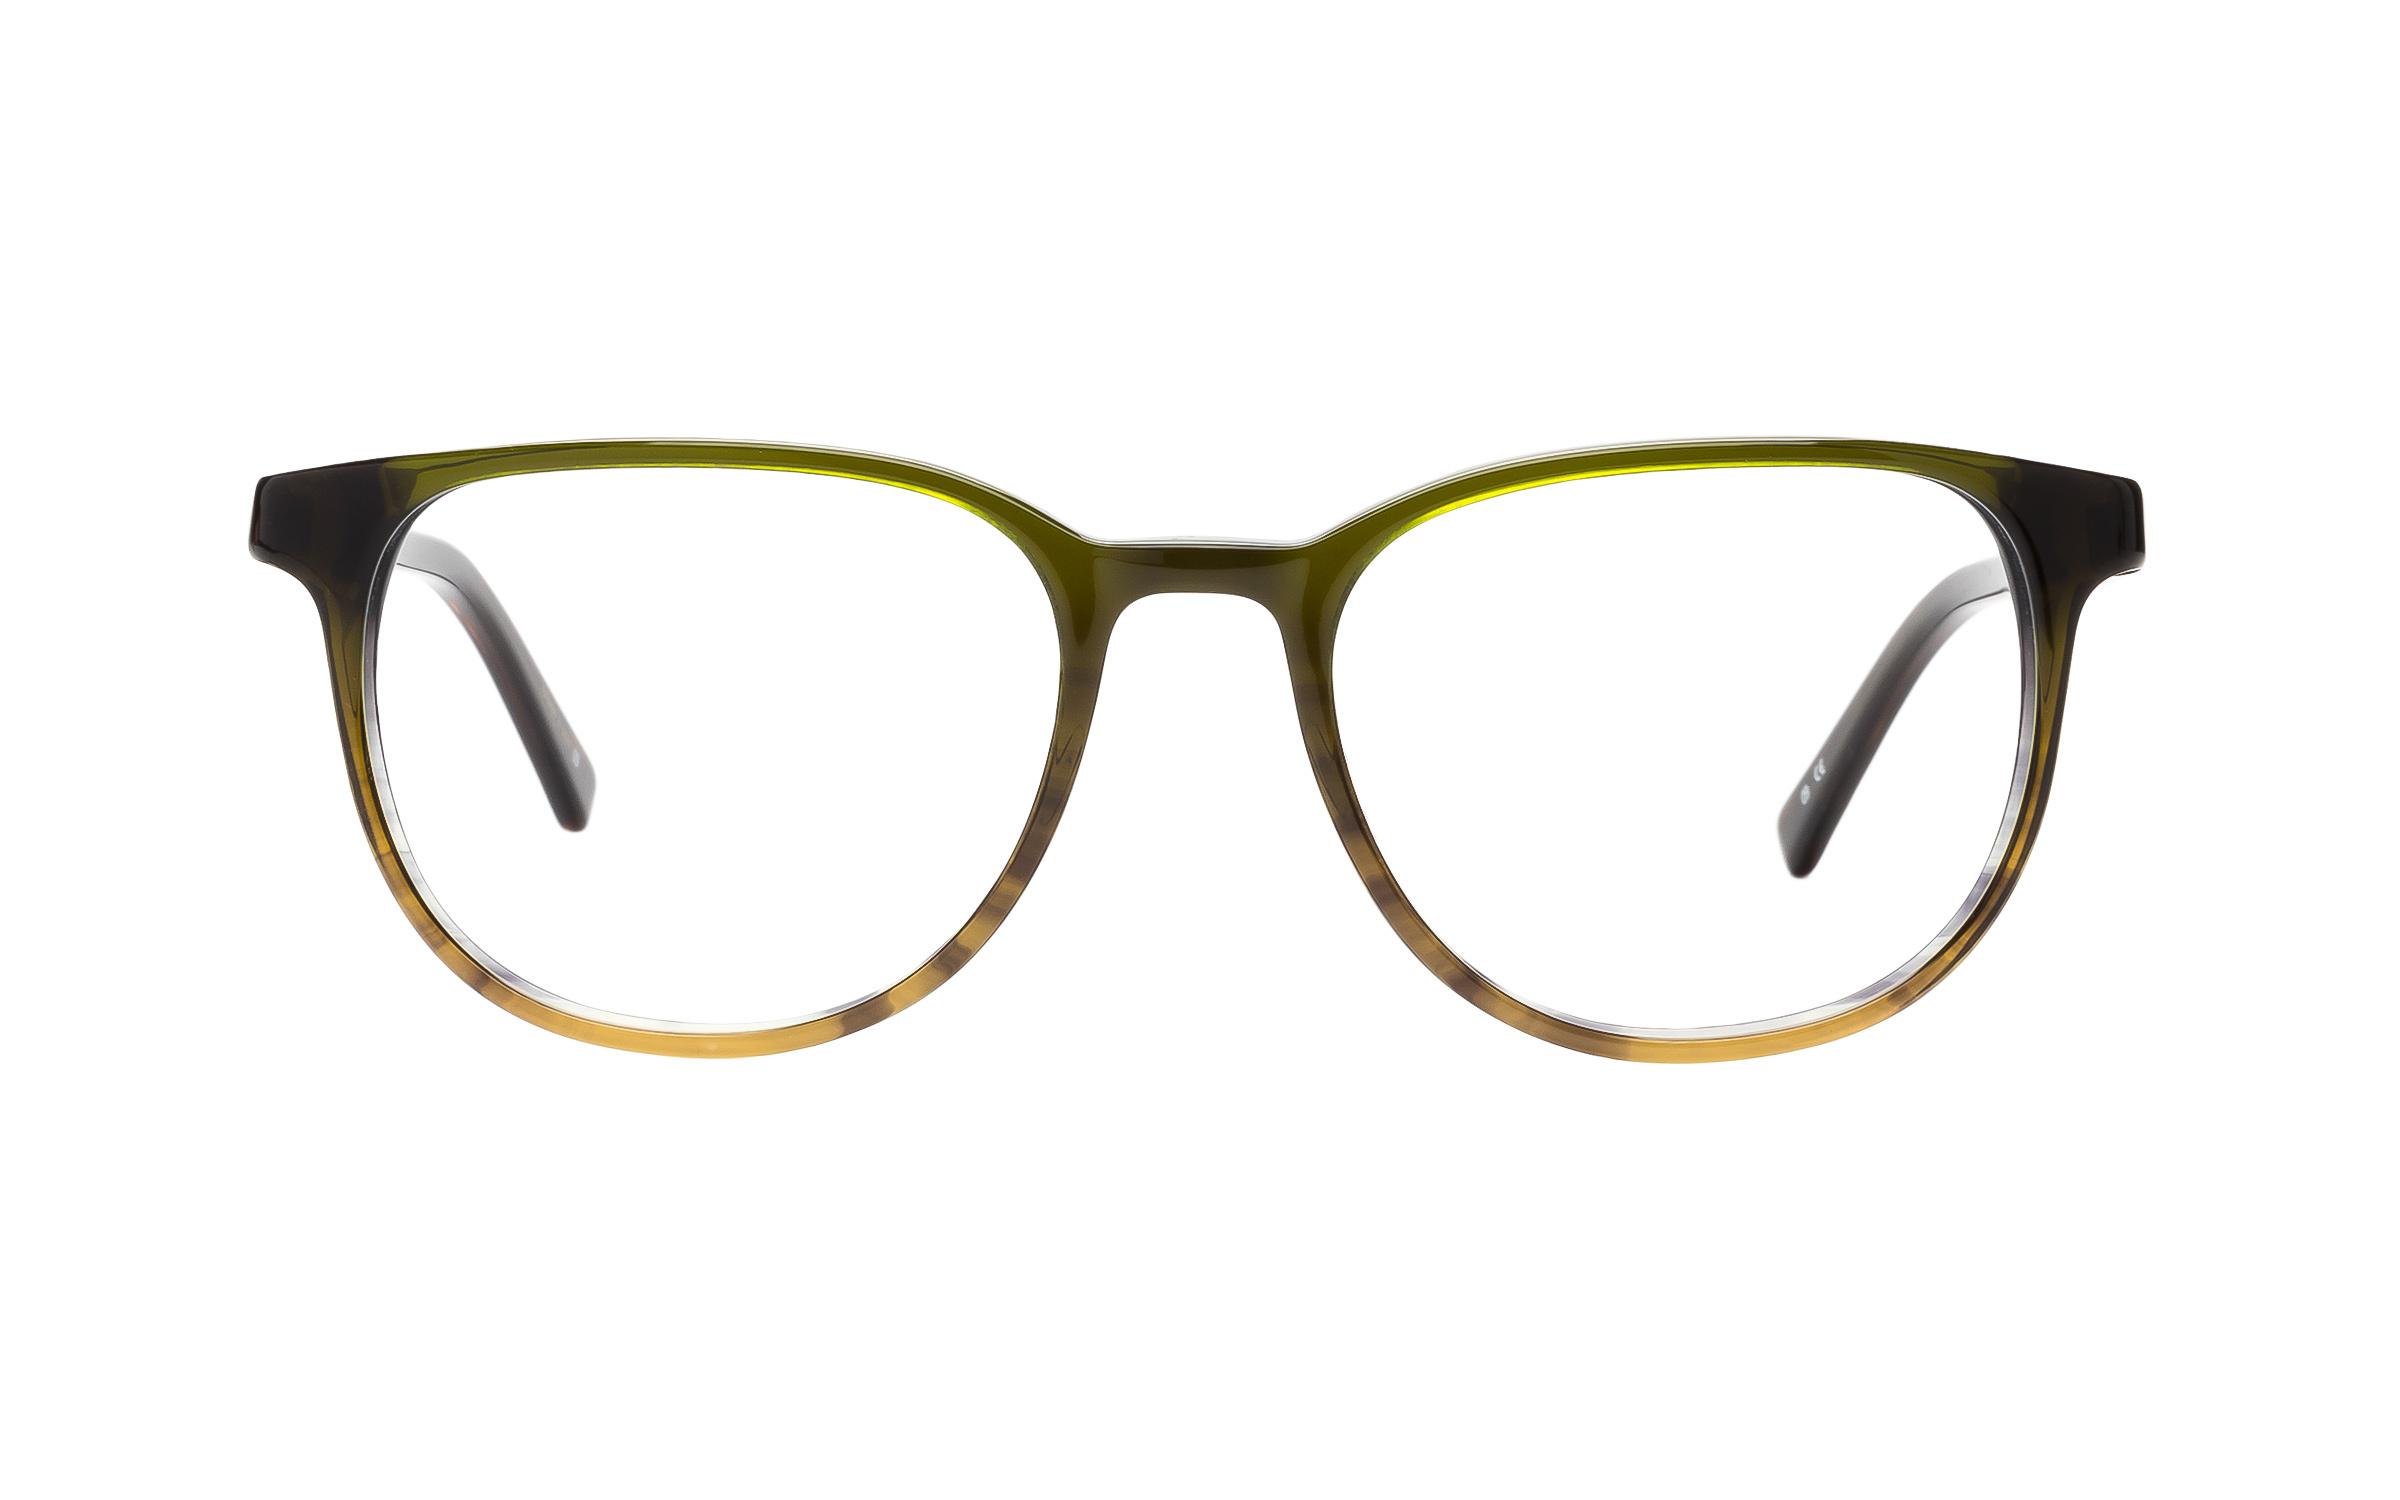 Penguin eyeglass frames | Compare Prices at Nextag